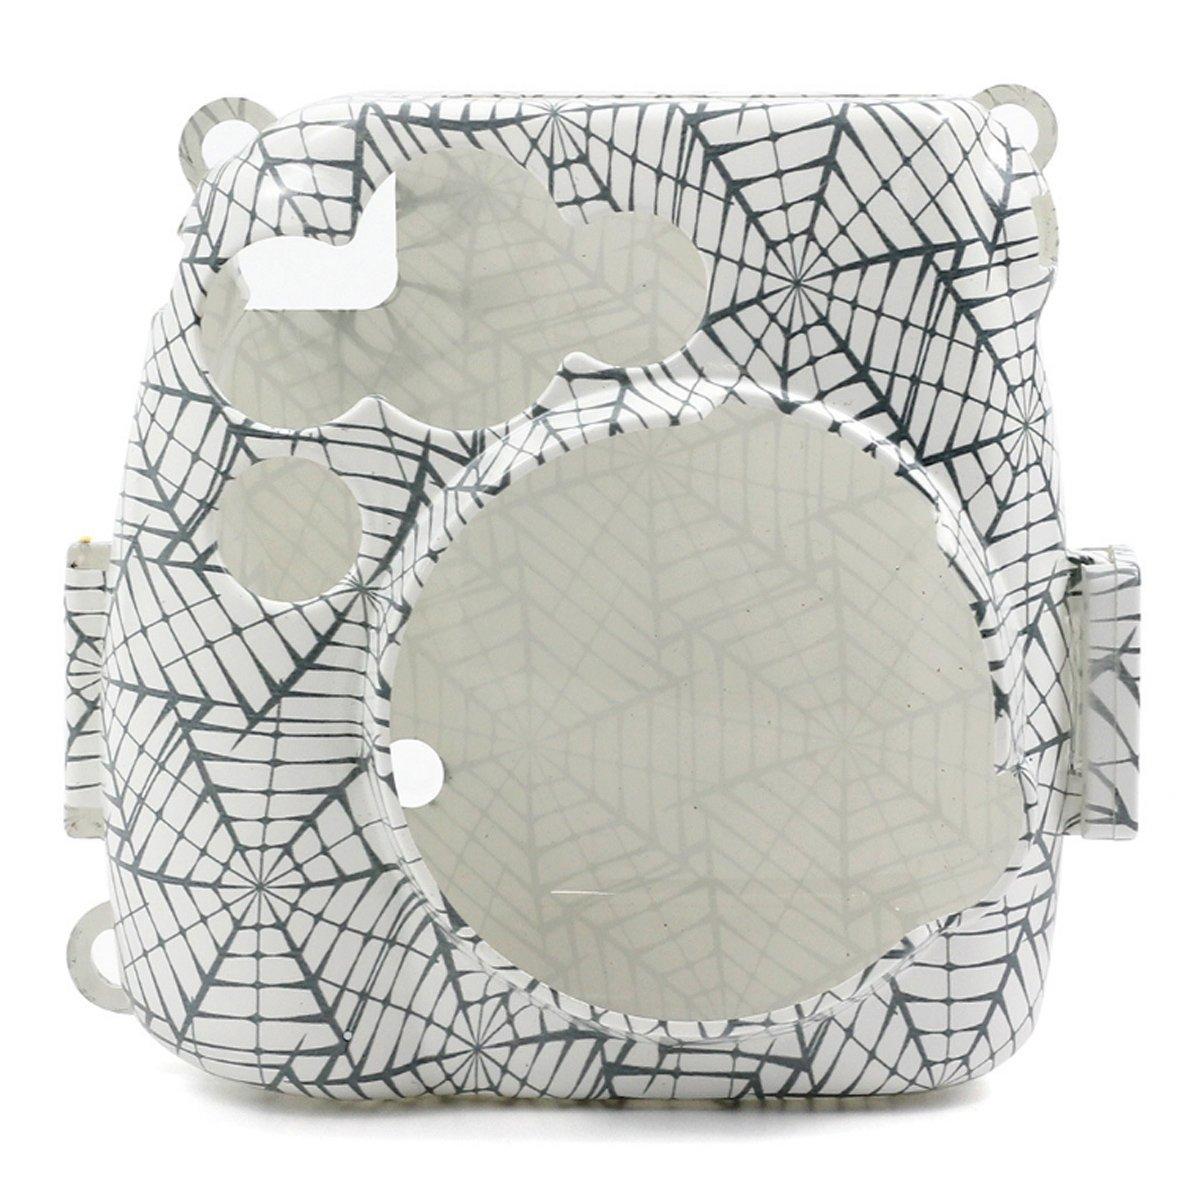 Uniuni Spider's web Cobweb Printed Plastic Protect Case for Fujifilm Instax Mini 8/8+/9 Instant Camera With Removable Shoulder Strap